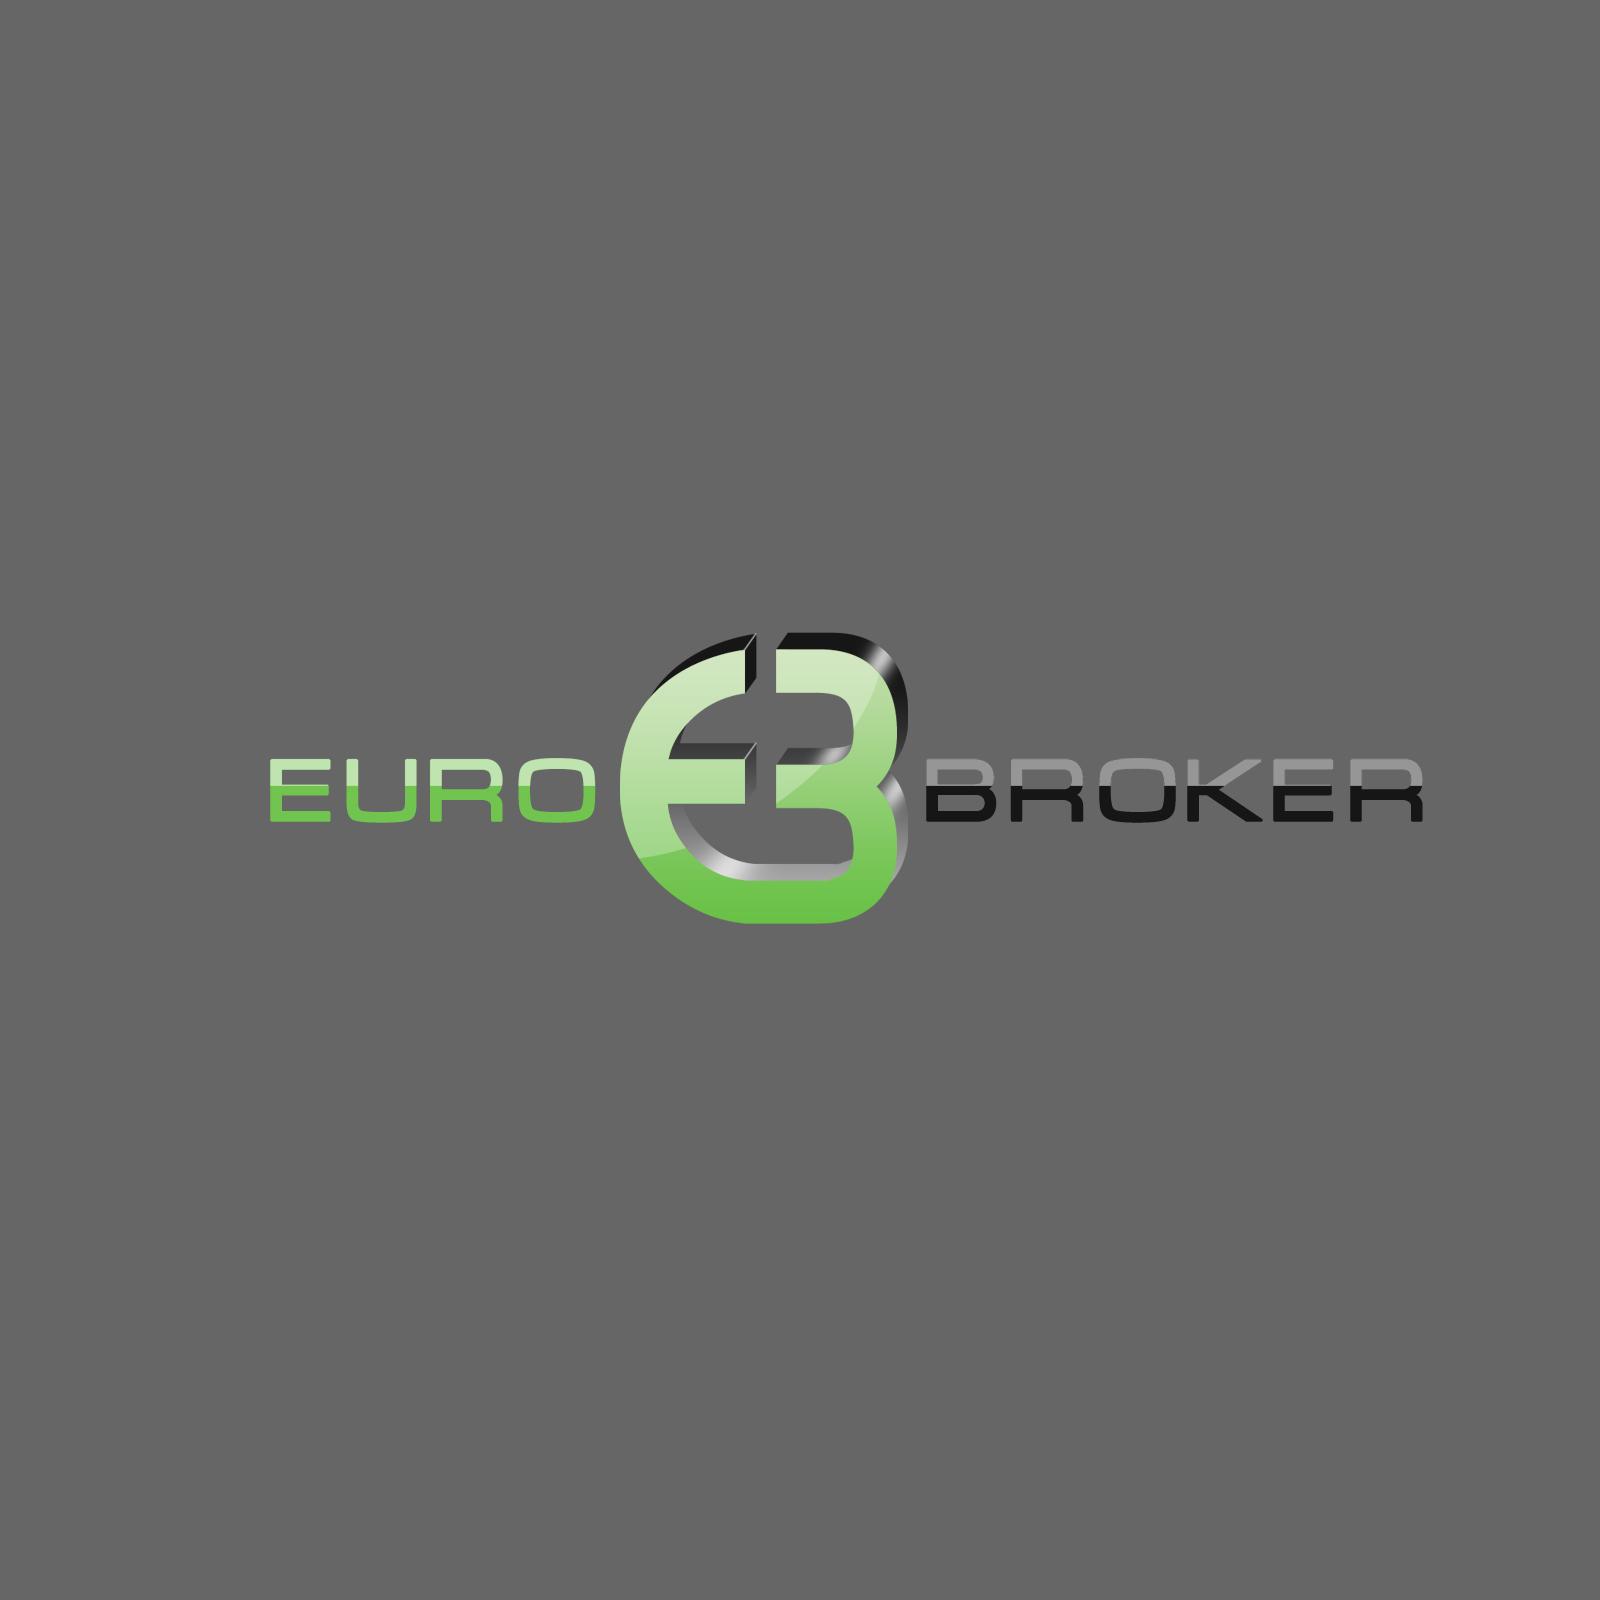 Разработка логотипа компании для сайта фото f_4beaa86801491.jpg